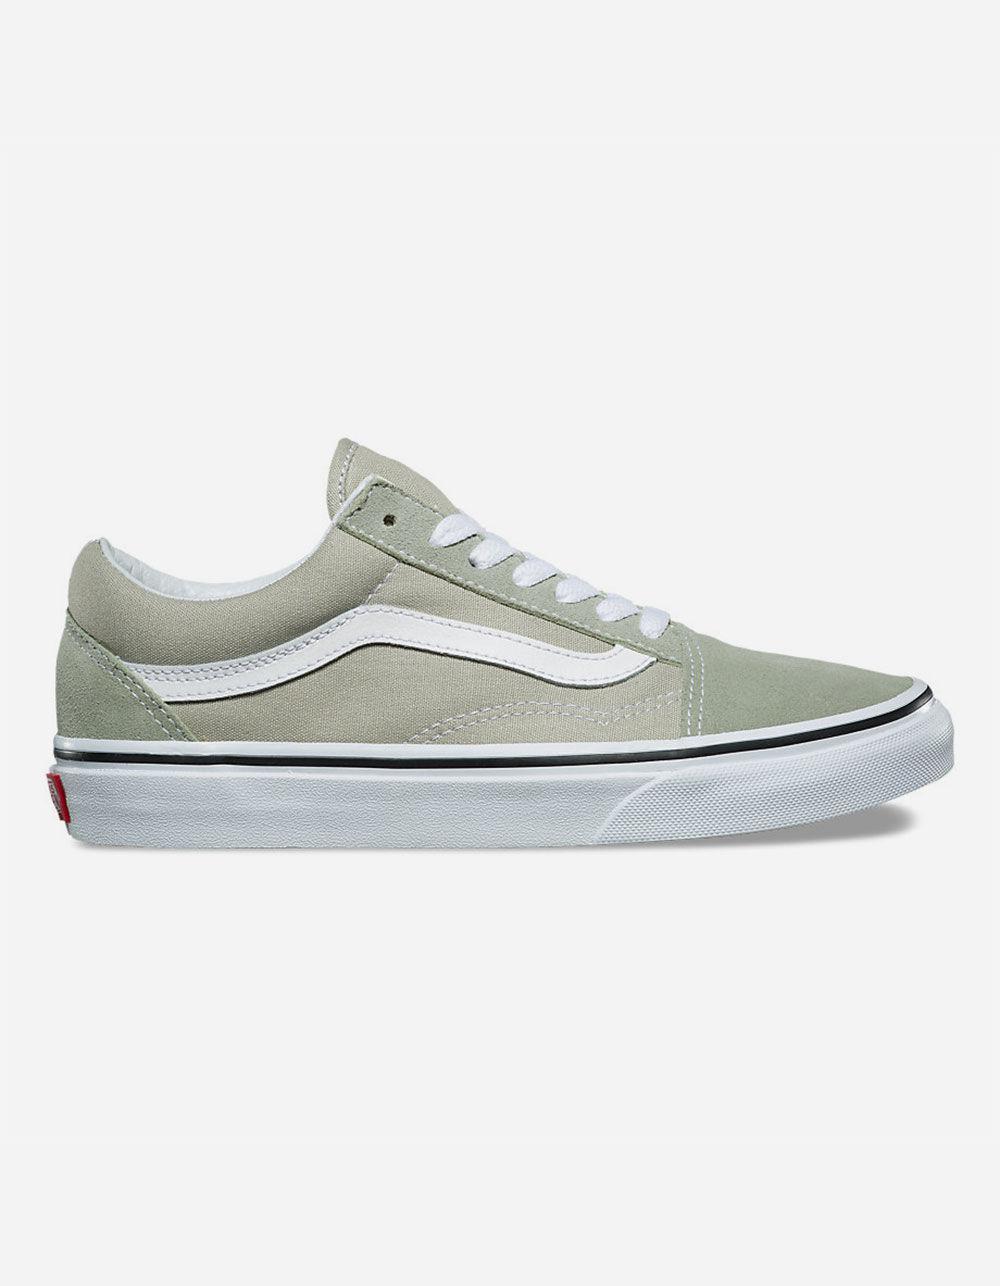 4a4c244c7e Lyst - Vans Old Skool Desert Sage   True White Womens Shoes in White ...